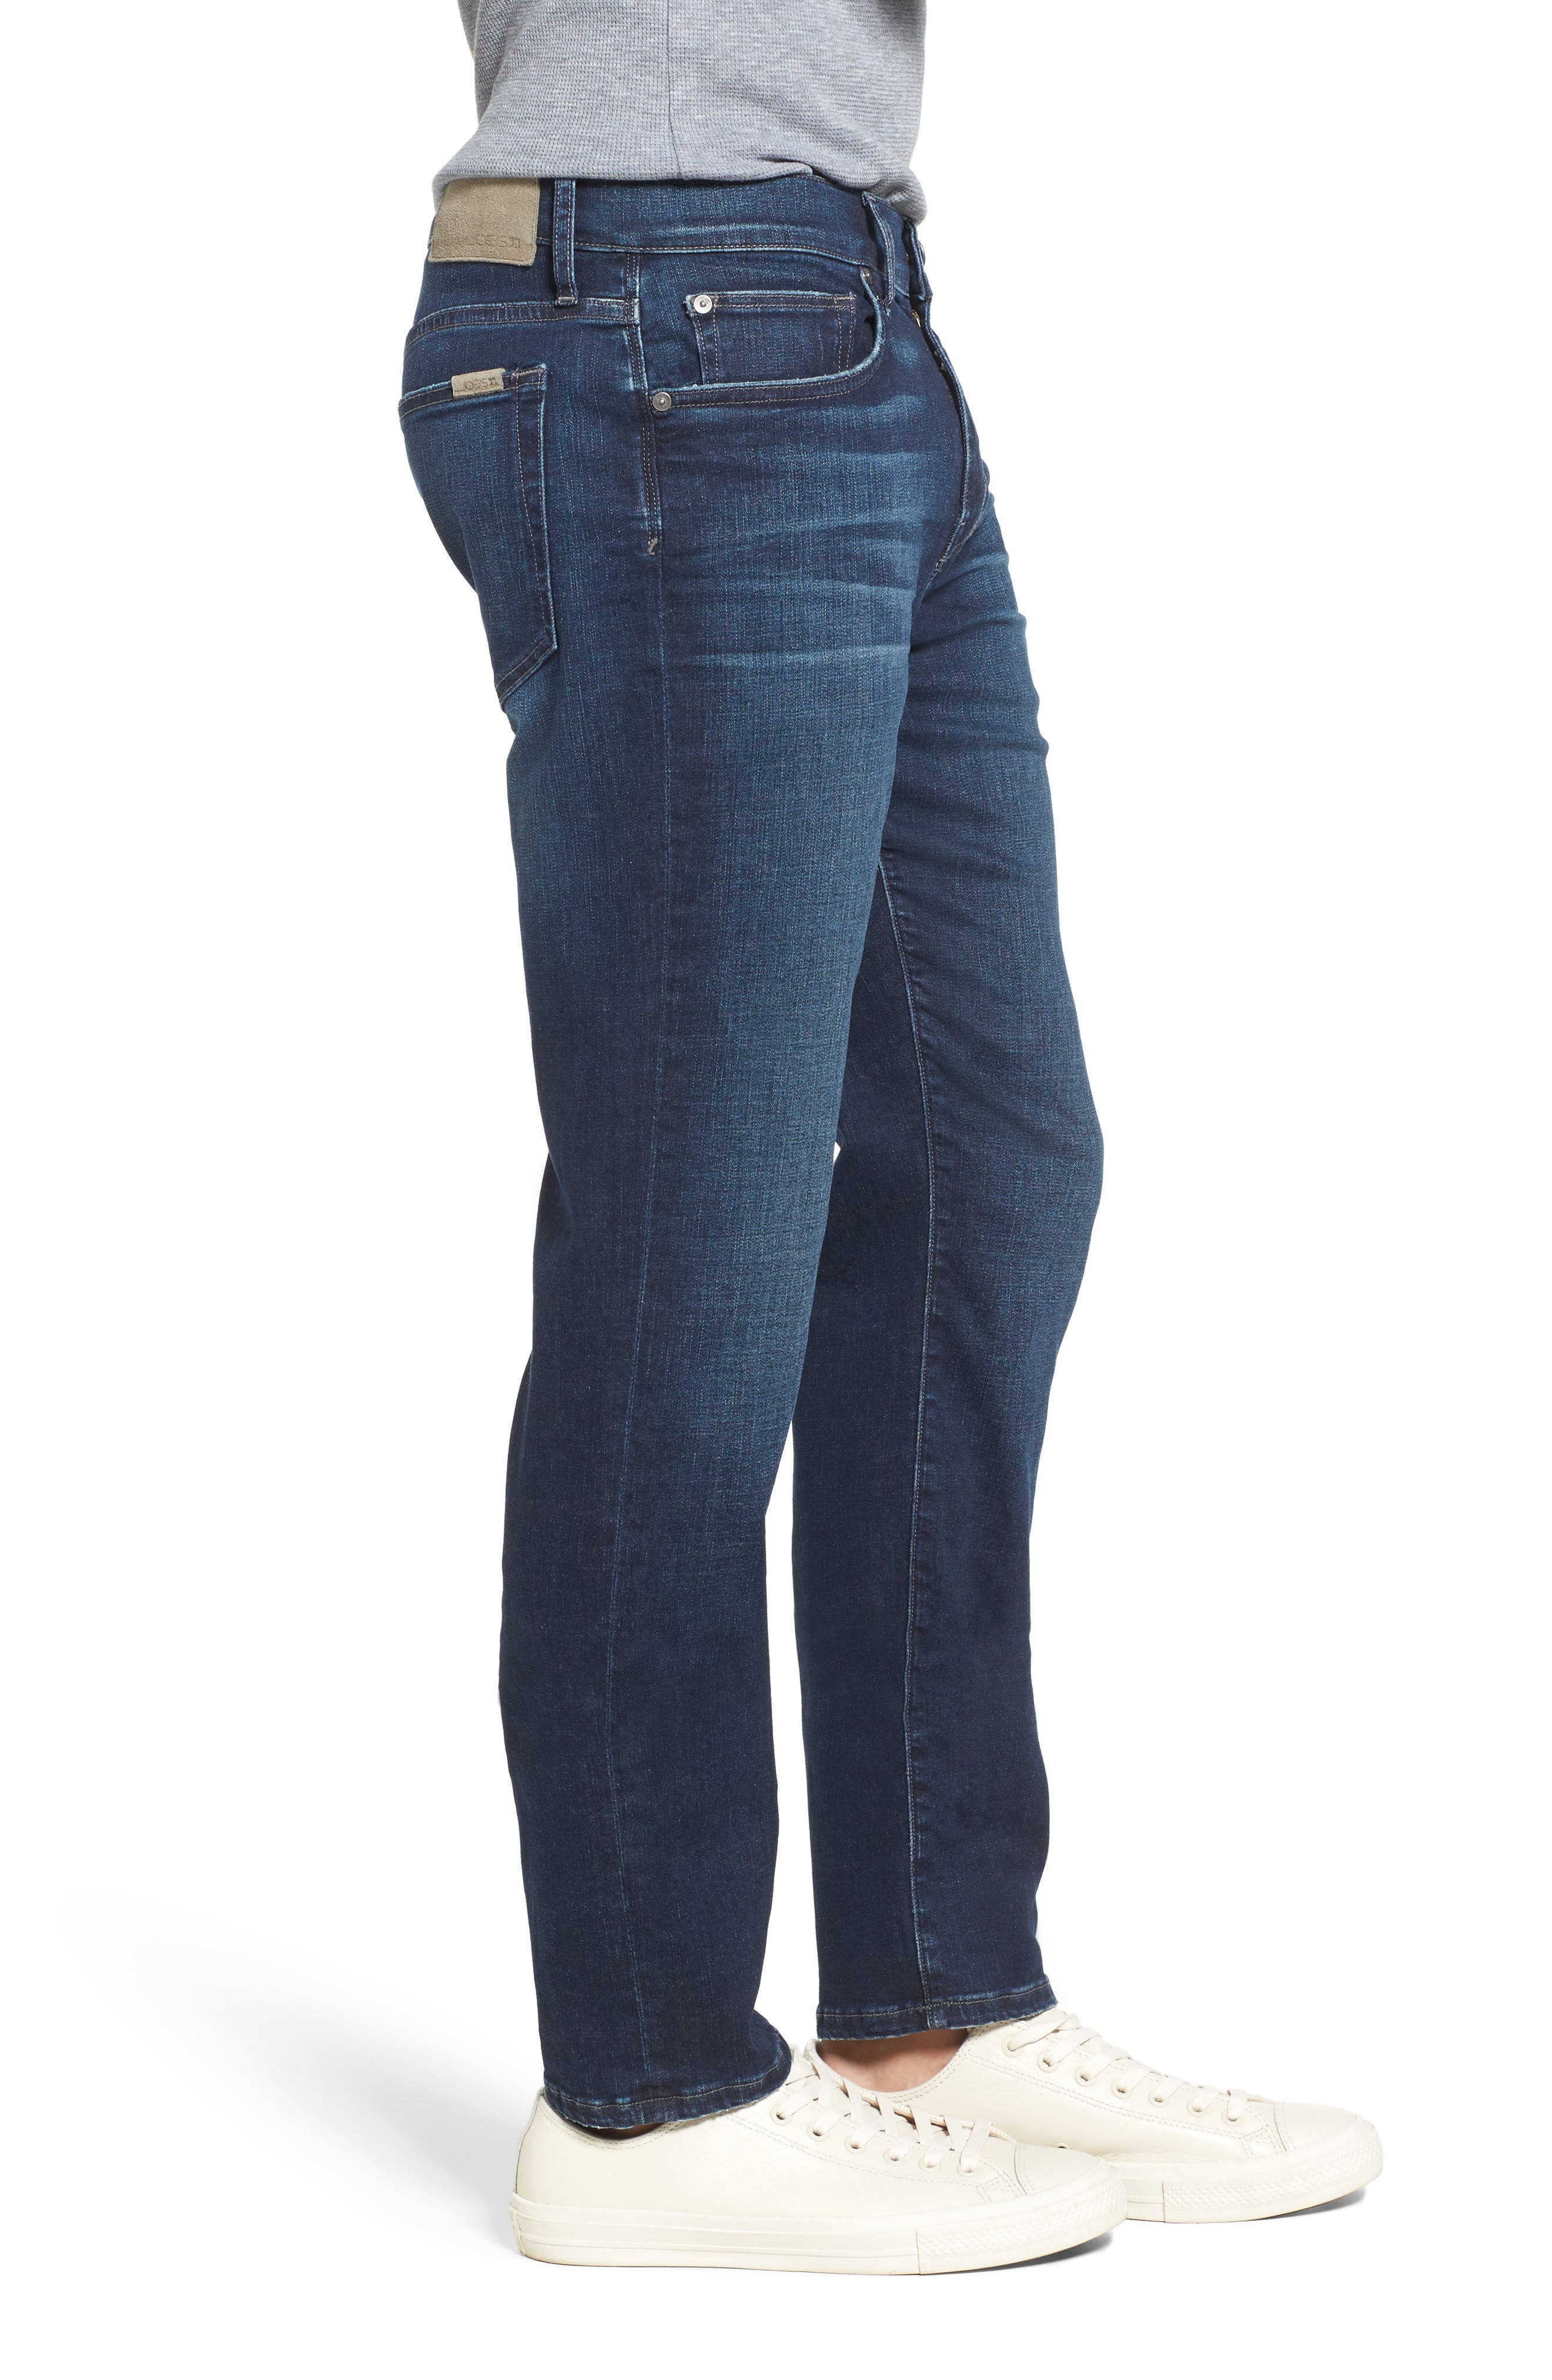 Kinetic Slim Fit Jeans,                             Alternate thumbnail 3, color,